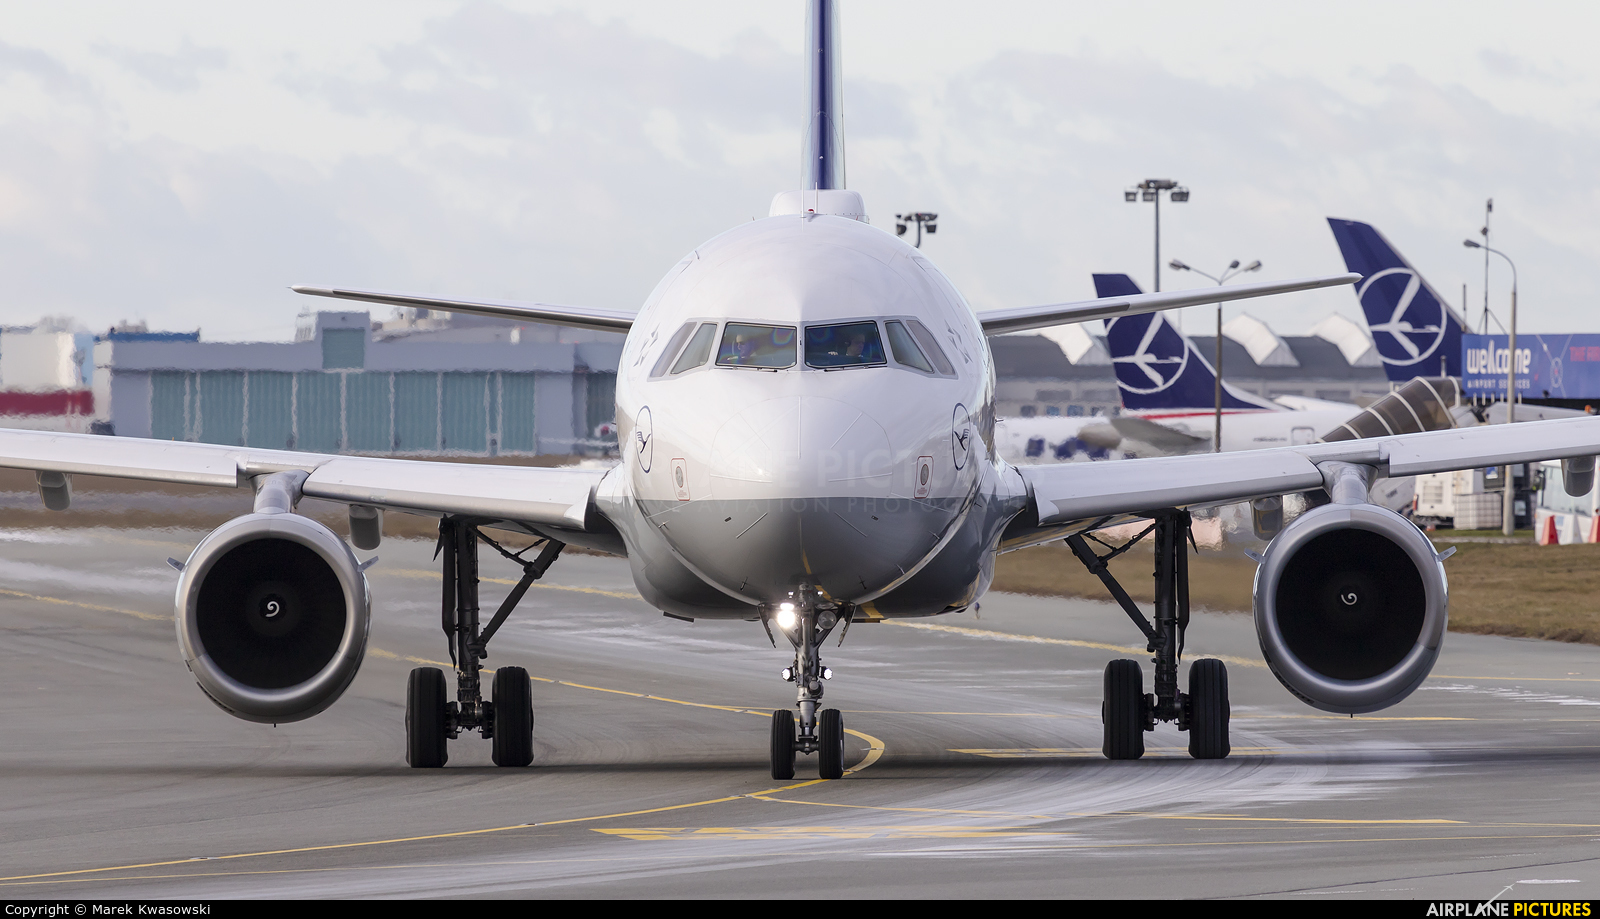 Lufthansa D-AILA aircraft at Warsaw - Frederic Chopin